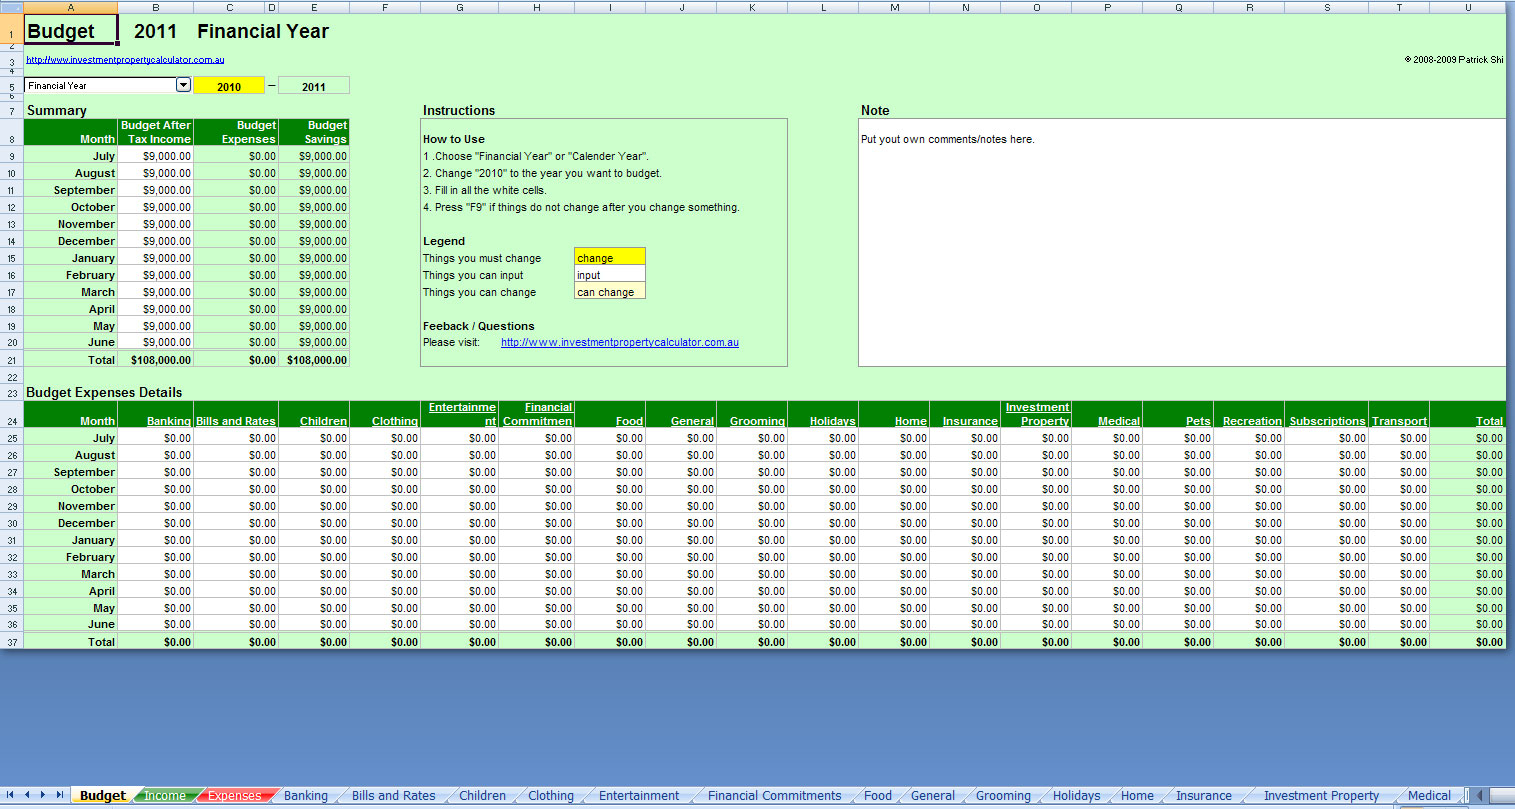 Budget Planner Spreadsheet Template Regarding Free Comprehensive Budget Planner Spreadsheet Excel